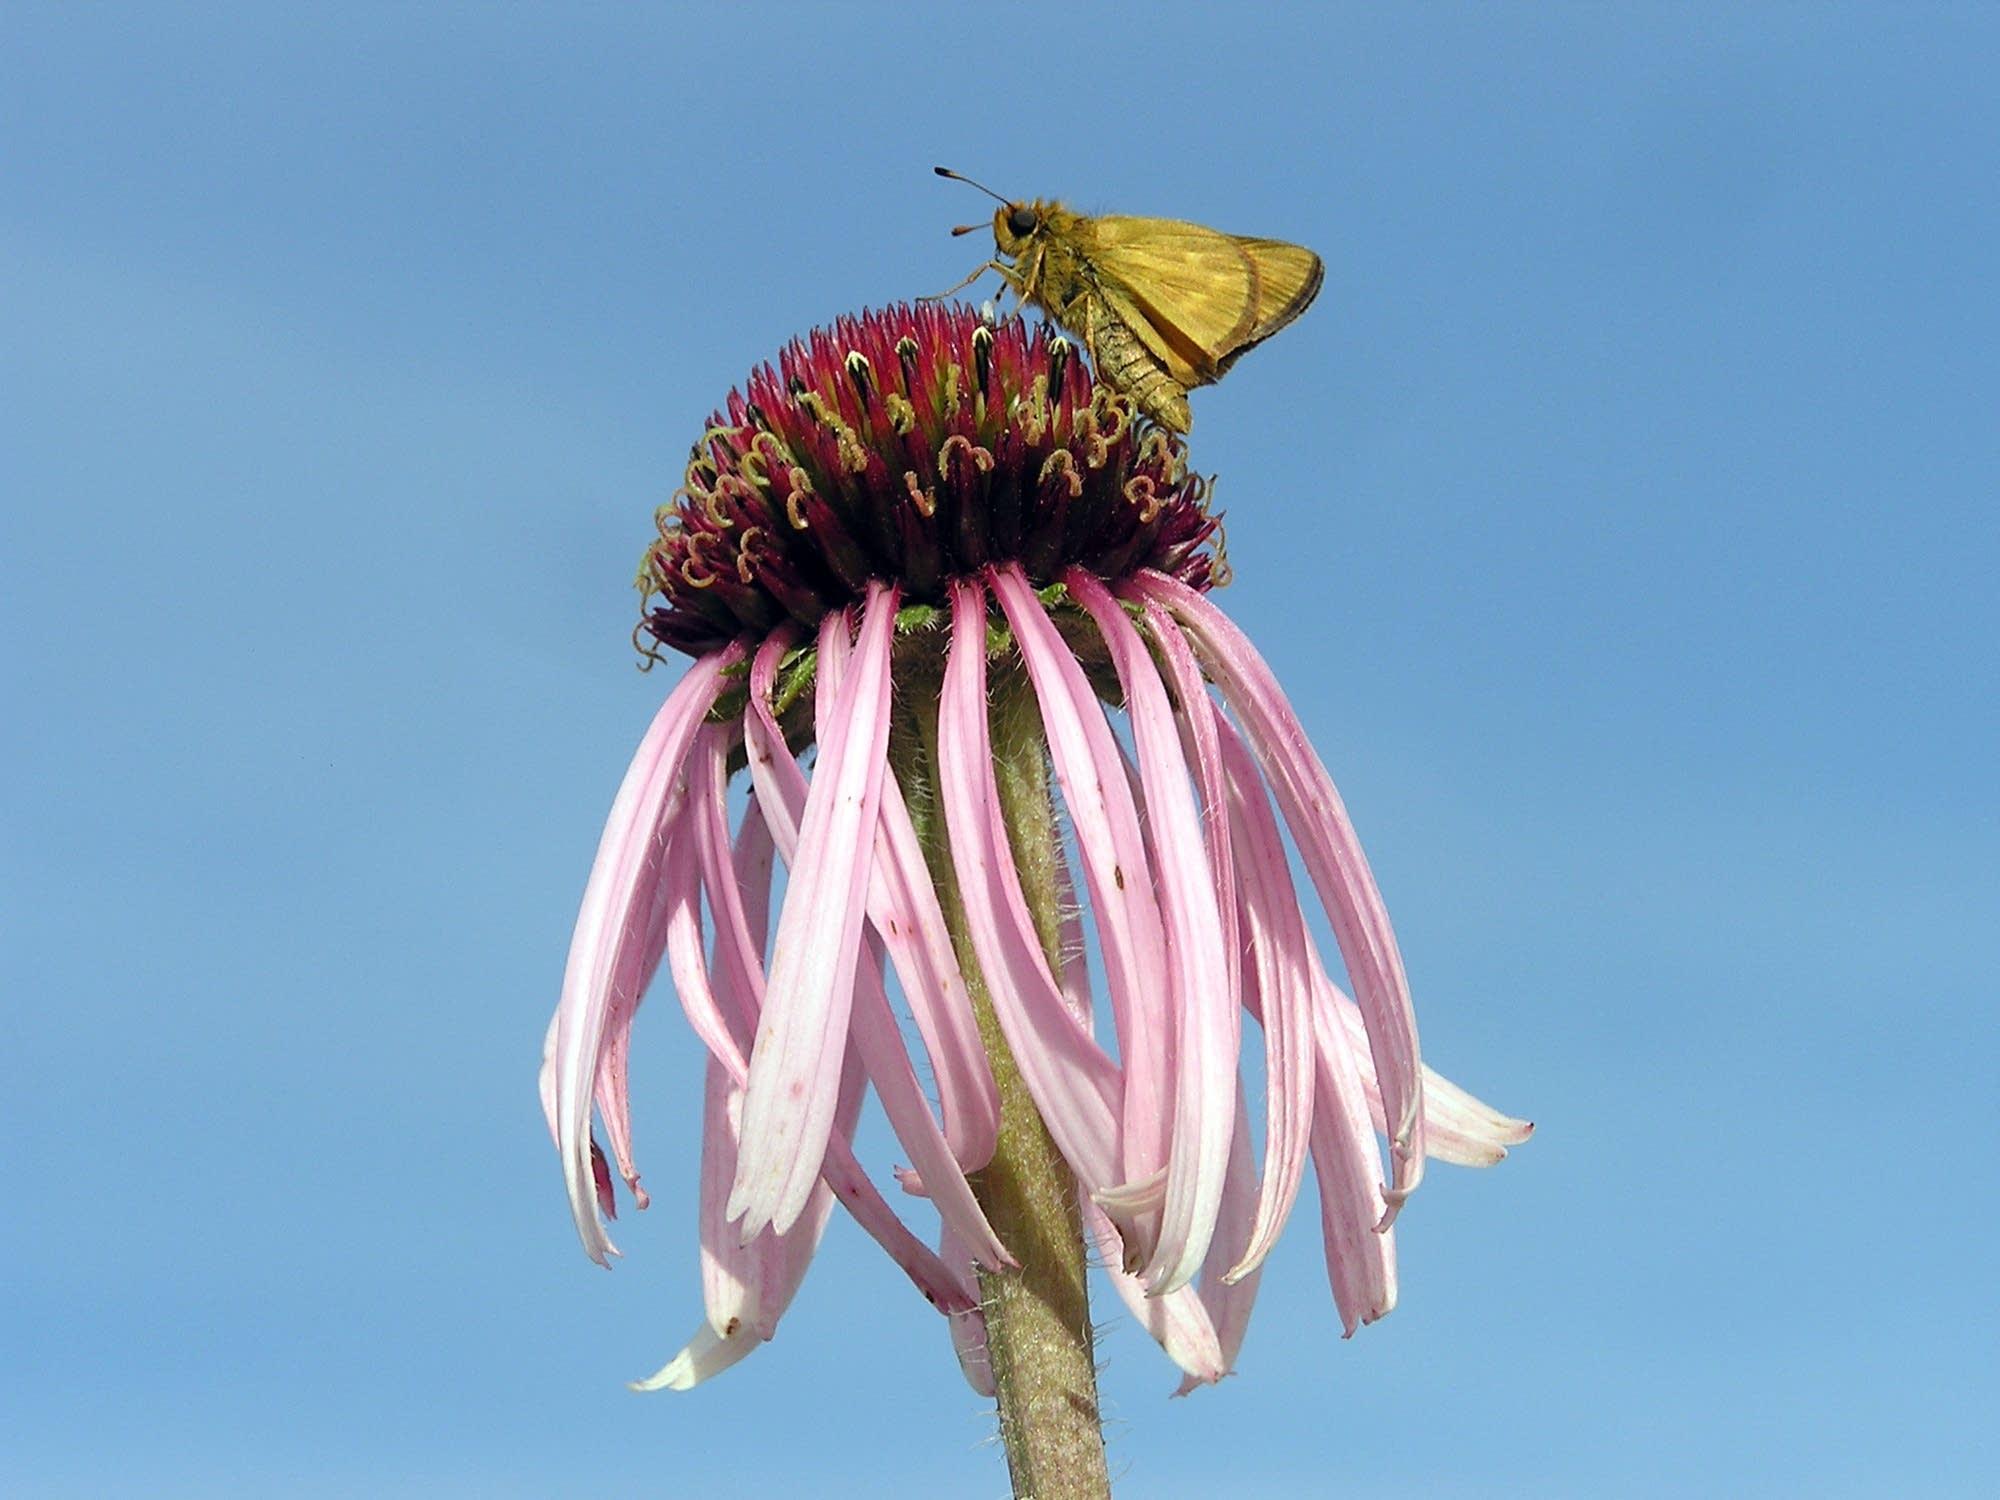 A Dakota Skipper butterfly perches on a coneflower.